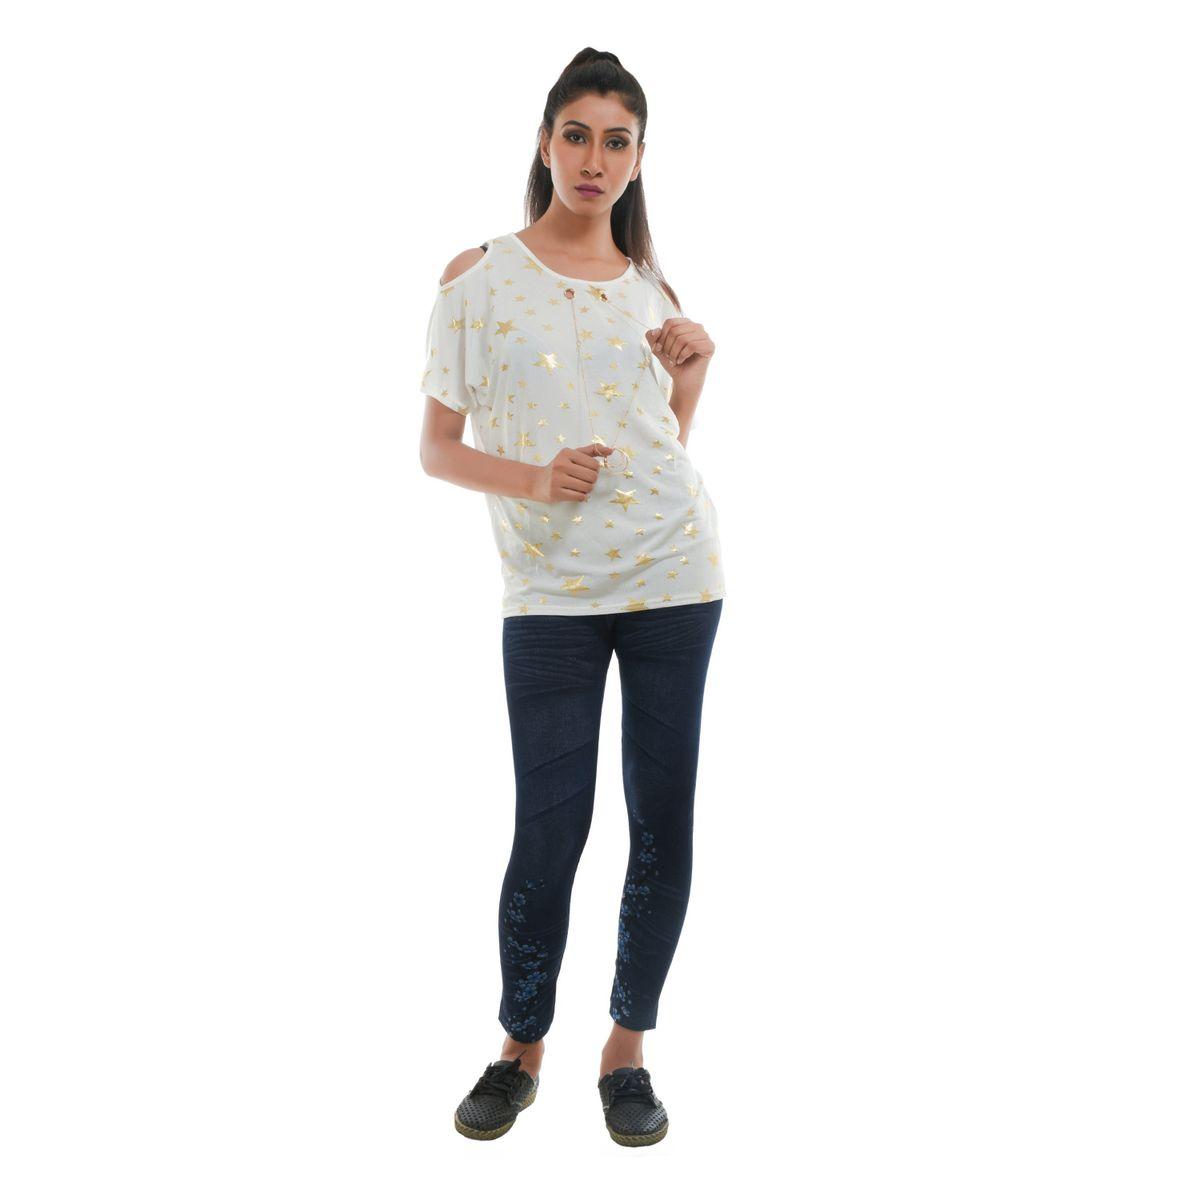 Ziva Fashion Womens White Star Print Cold Shoulder Top T57-S